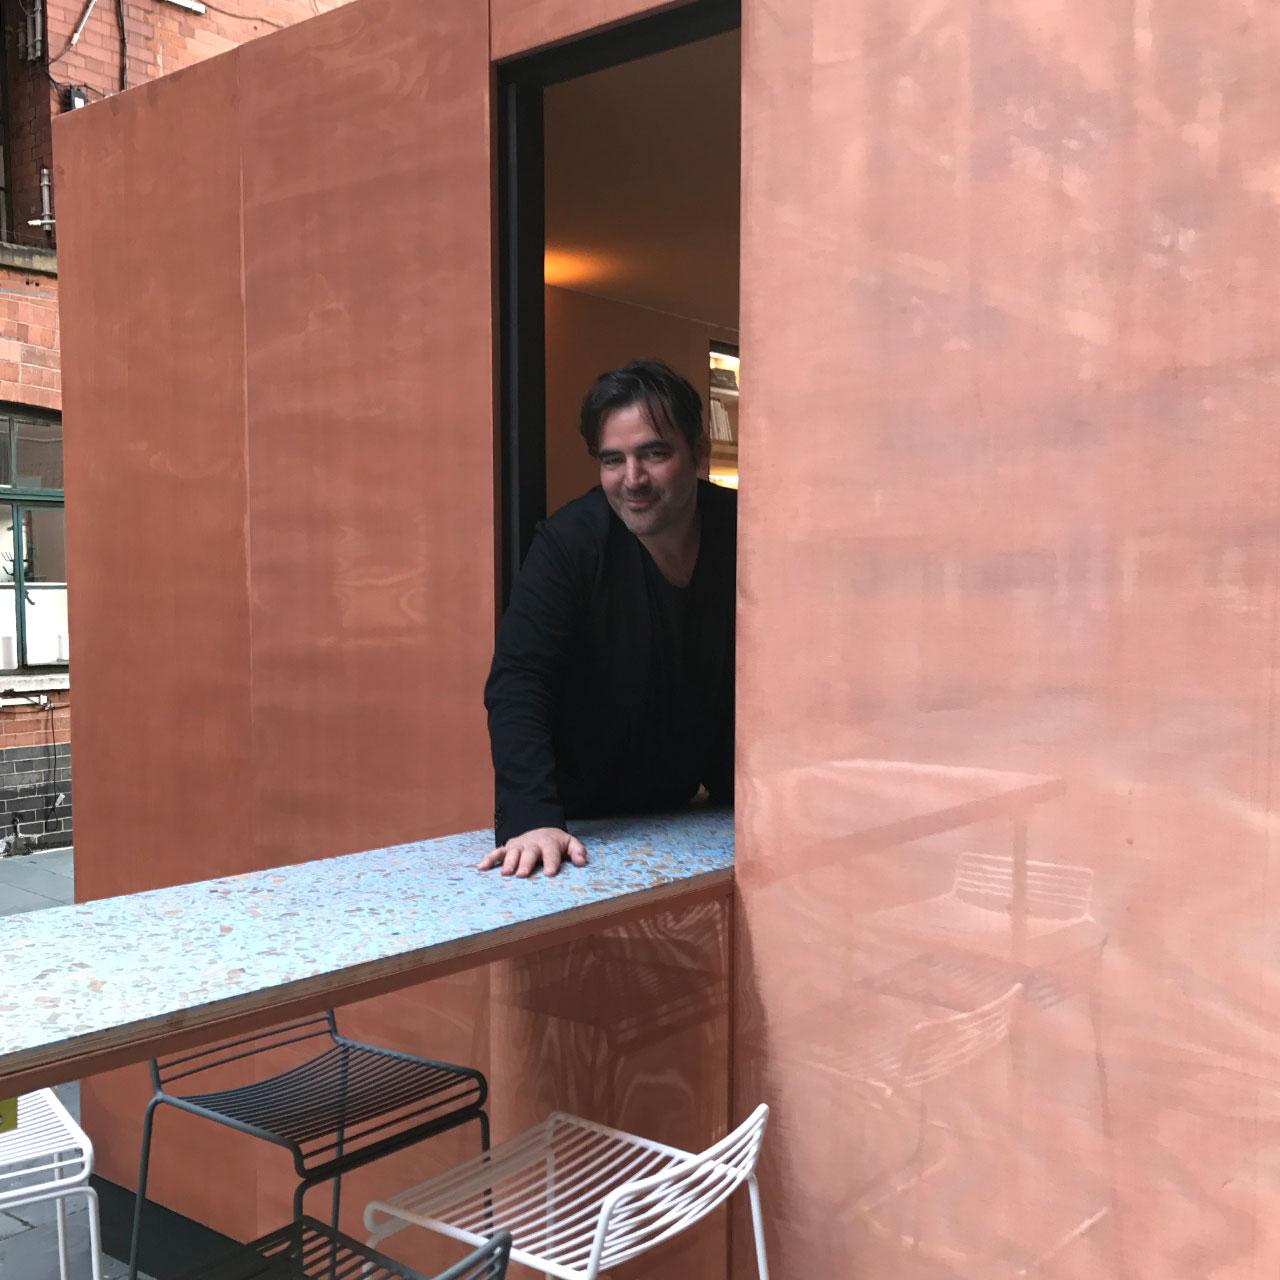 LDF17: MINI LIVING Launches First Urban Cabin